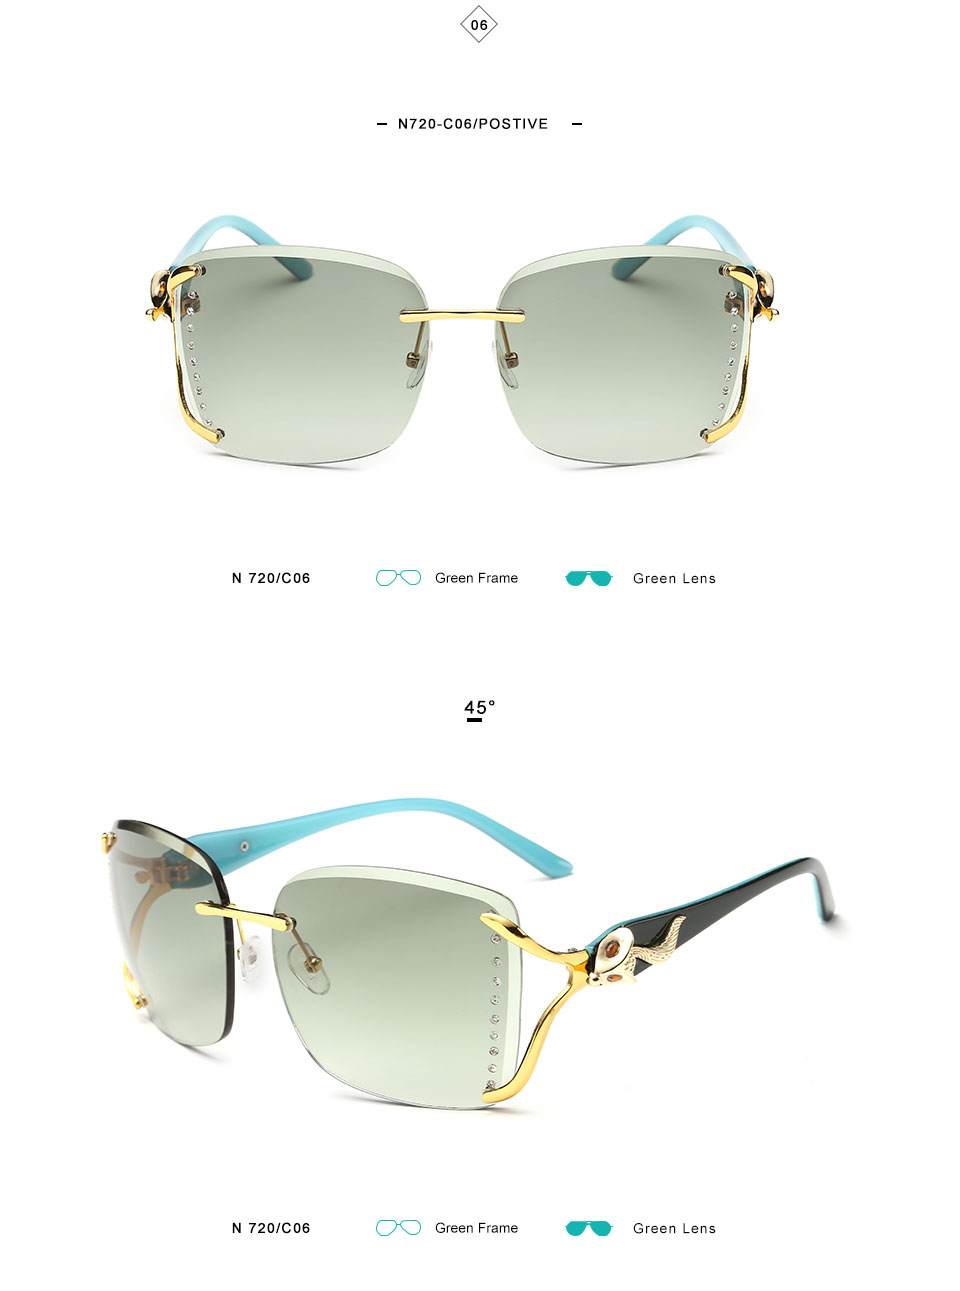 KINGSEEVEN Elegant Female Sunglasses Large frame fox decorated with diamond decoration Brand Designer Women's Glasses Feminine 10